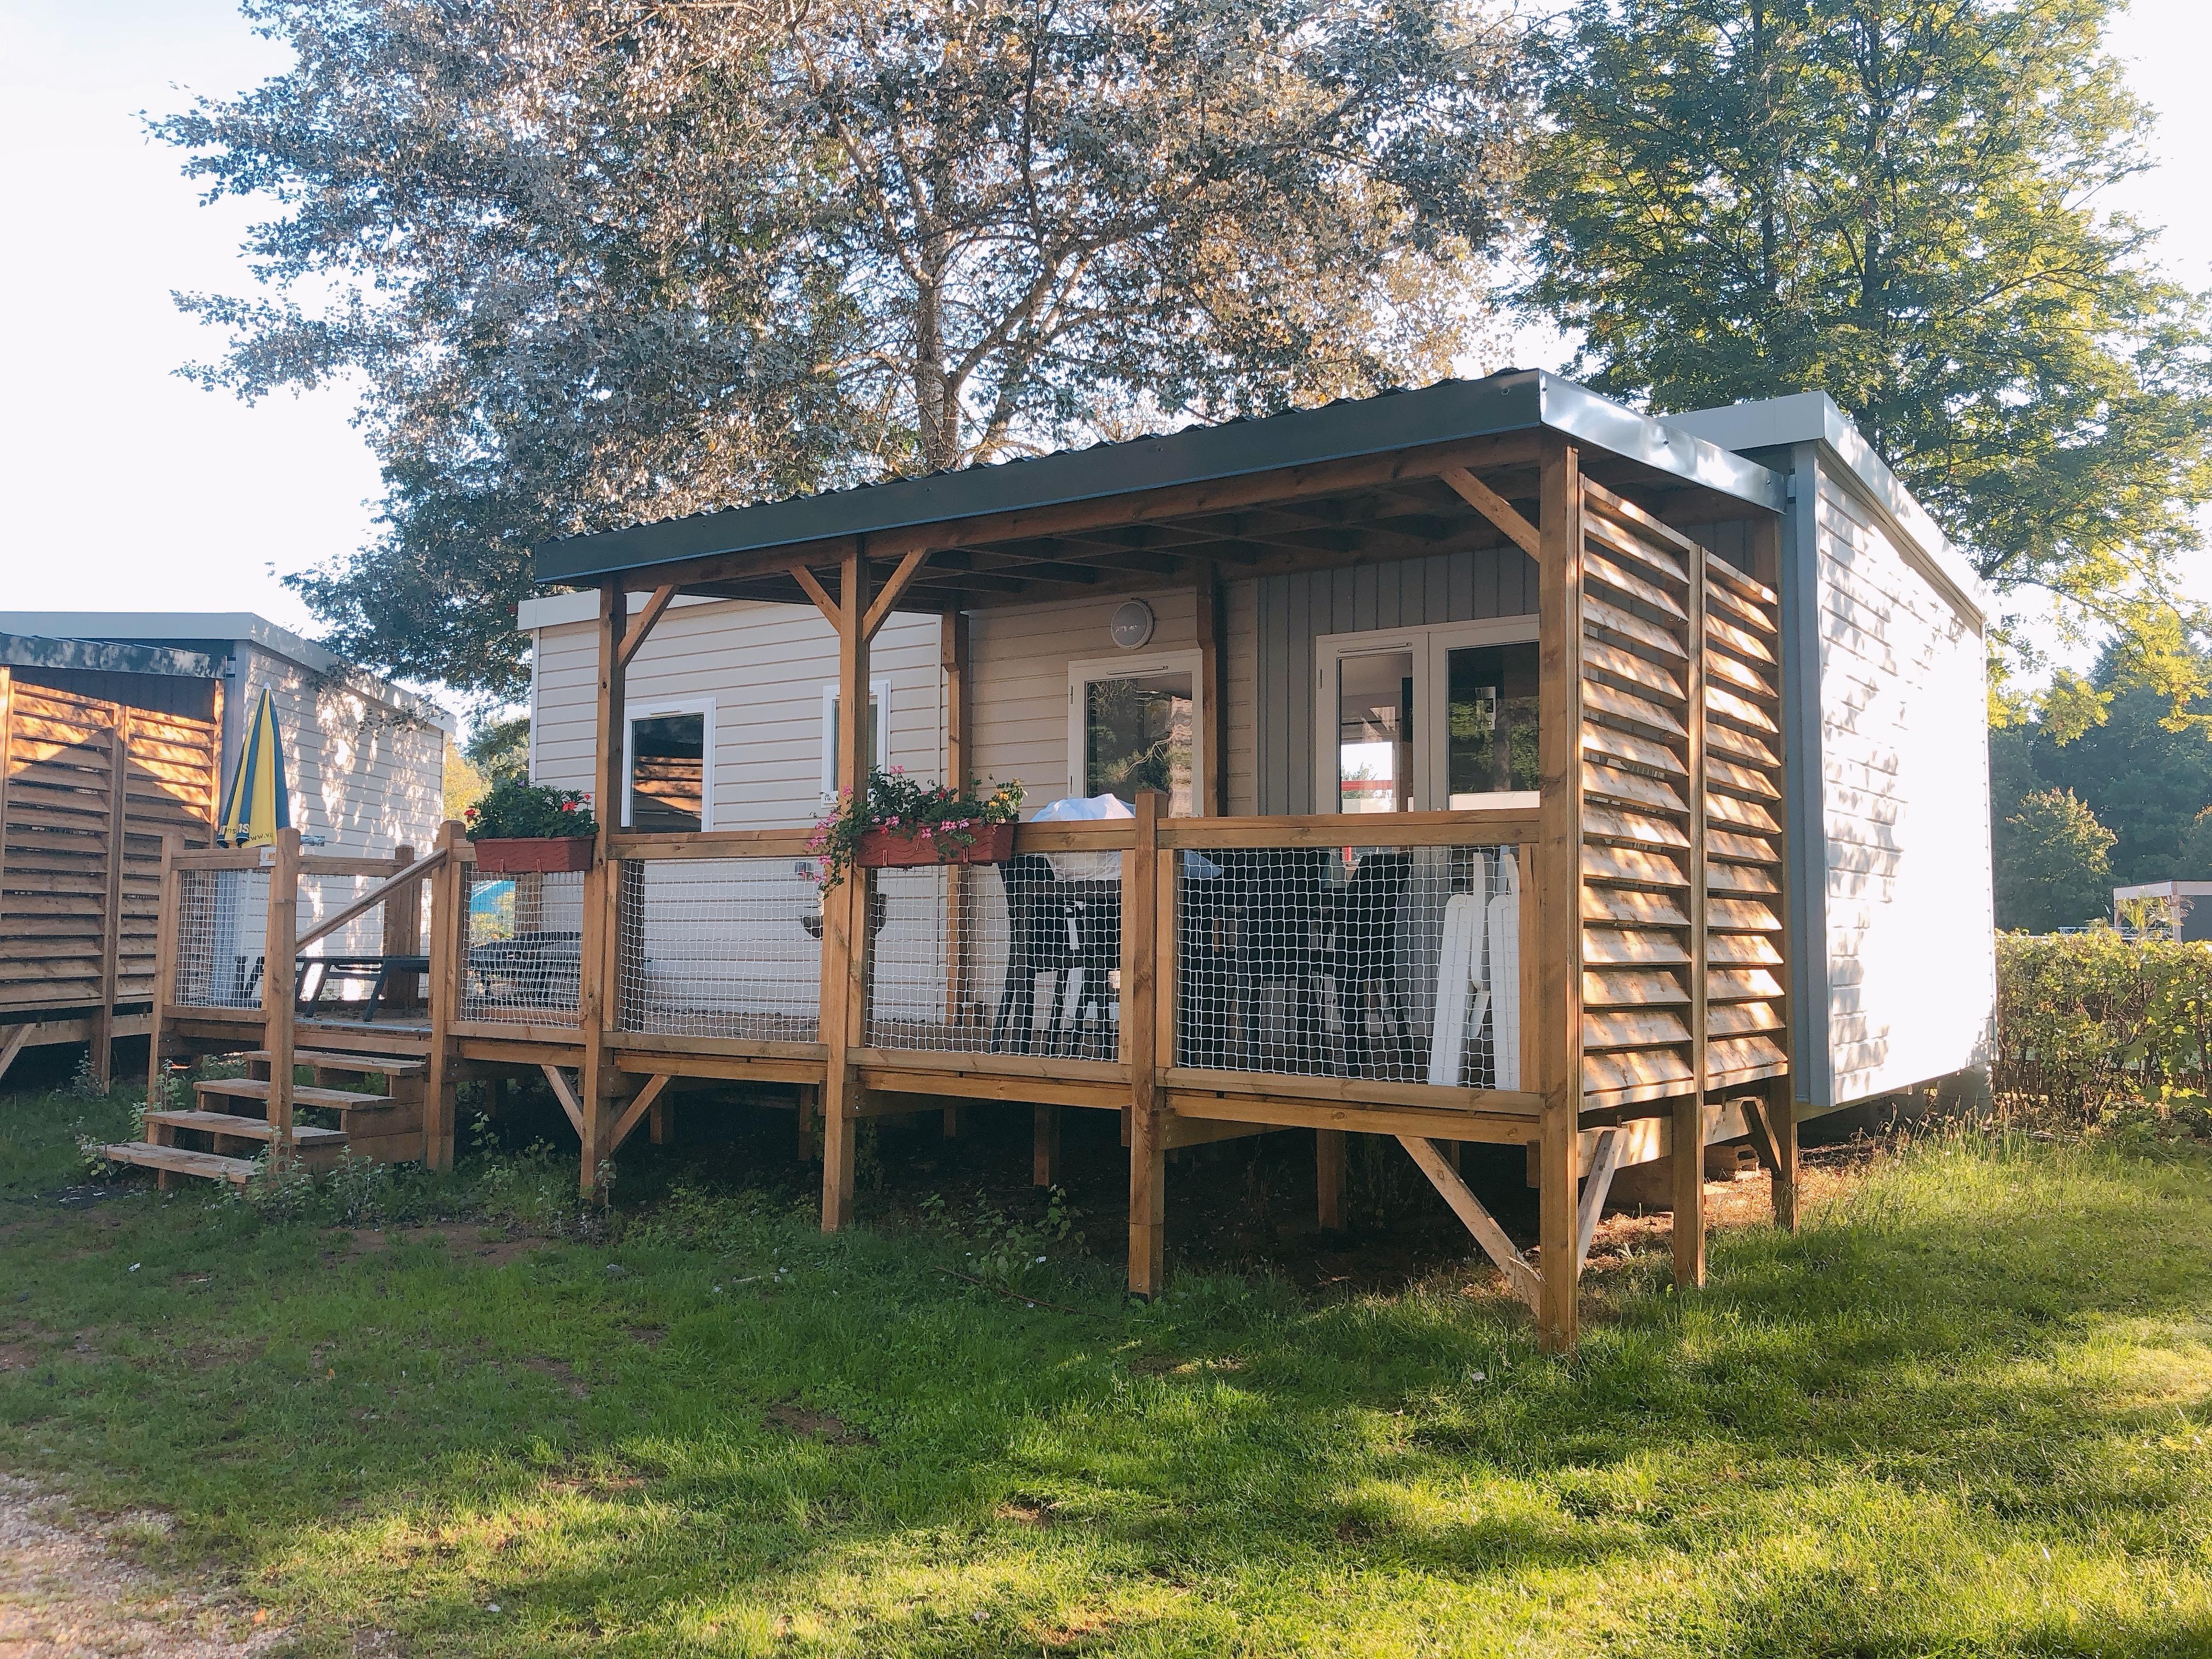 IMG 2195 1 - Fotodagboek Vakantie: Camping Iris Parc Birkelt in Luxemburg!